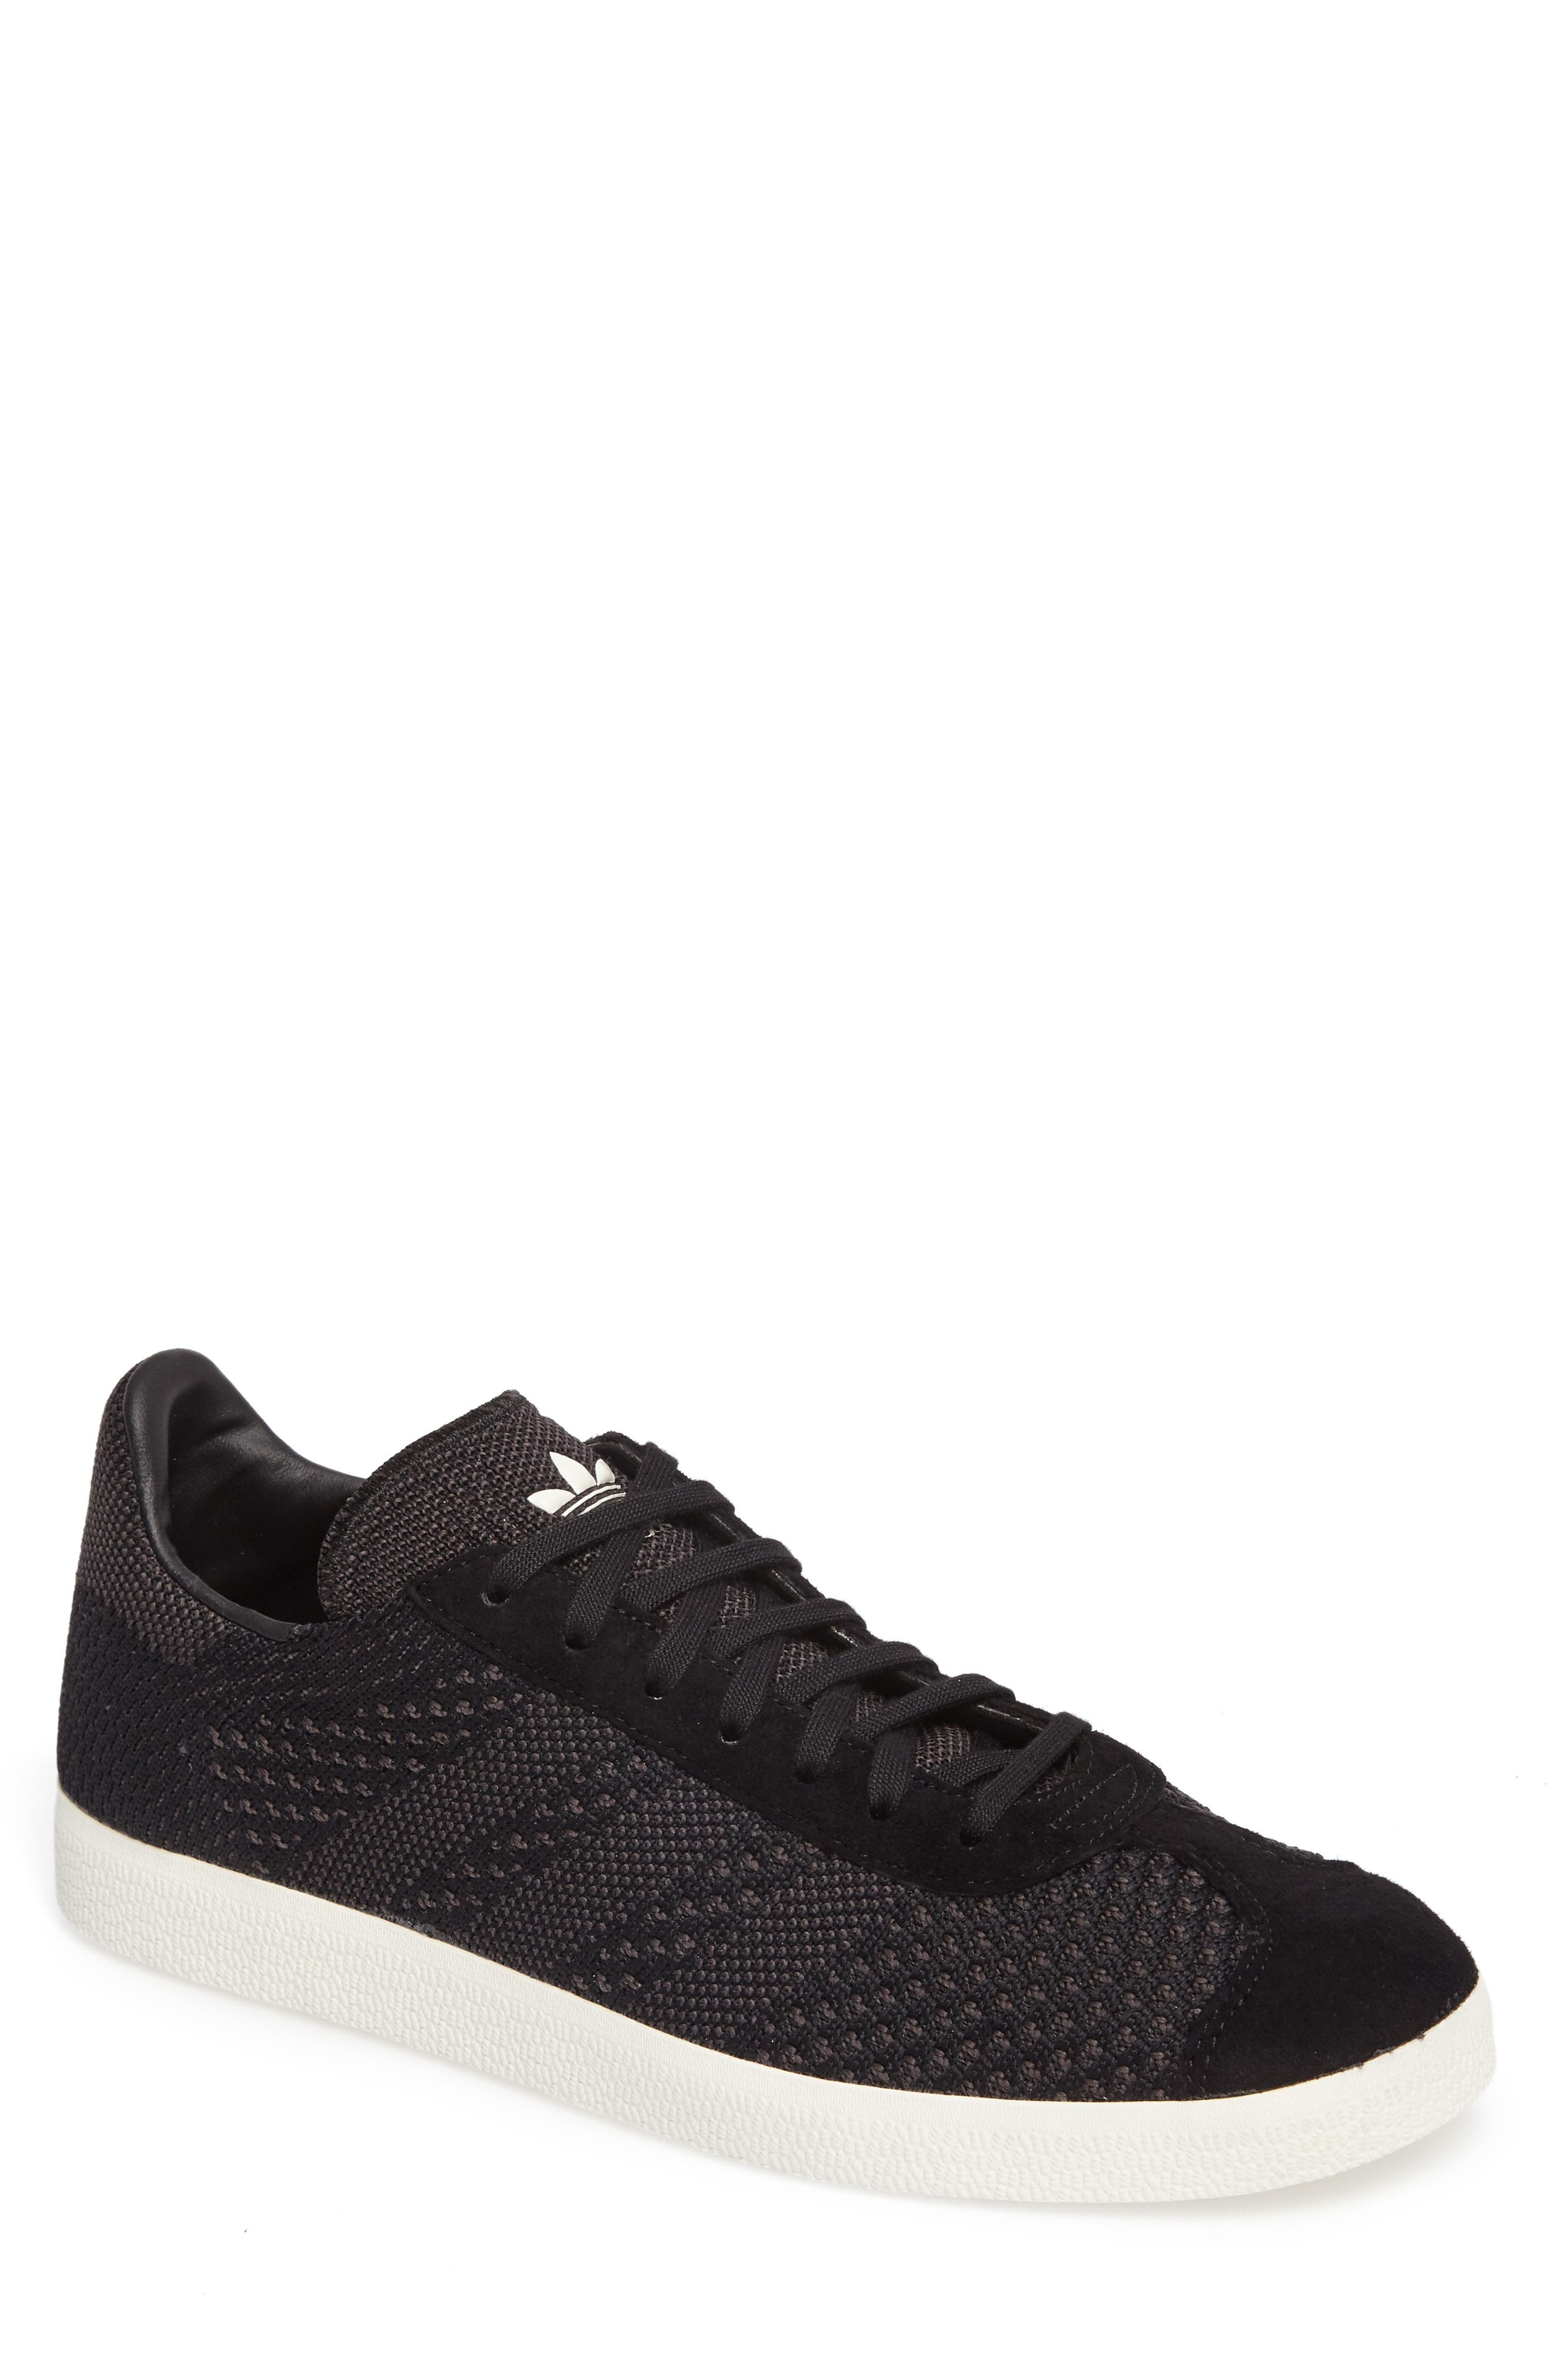 Gazelle Primeknit Sneaker,                         Main,                         color,